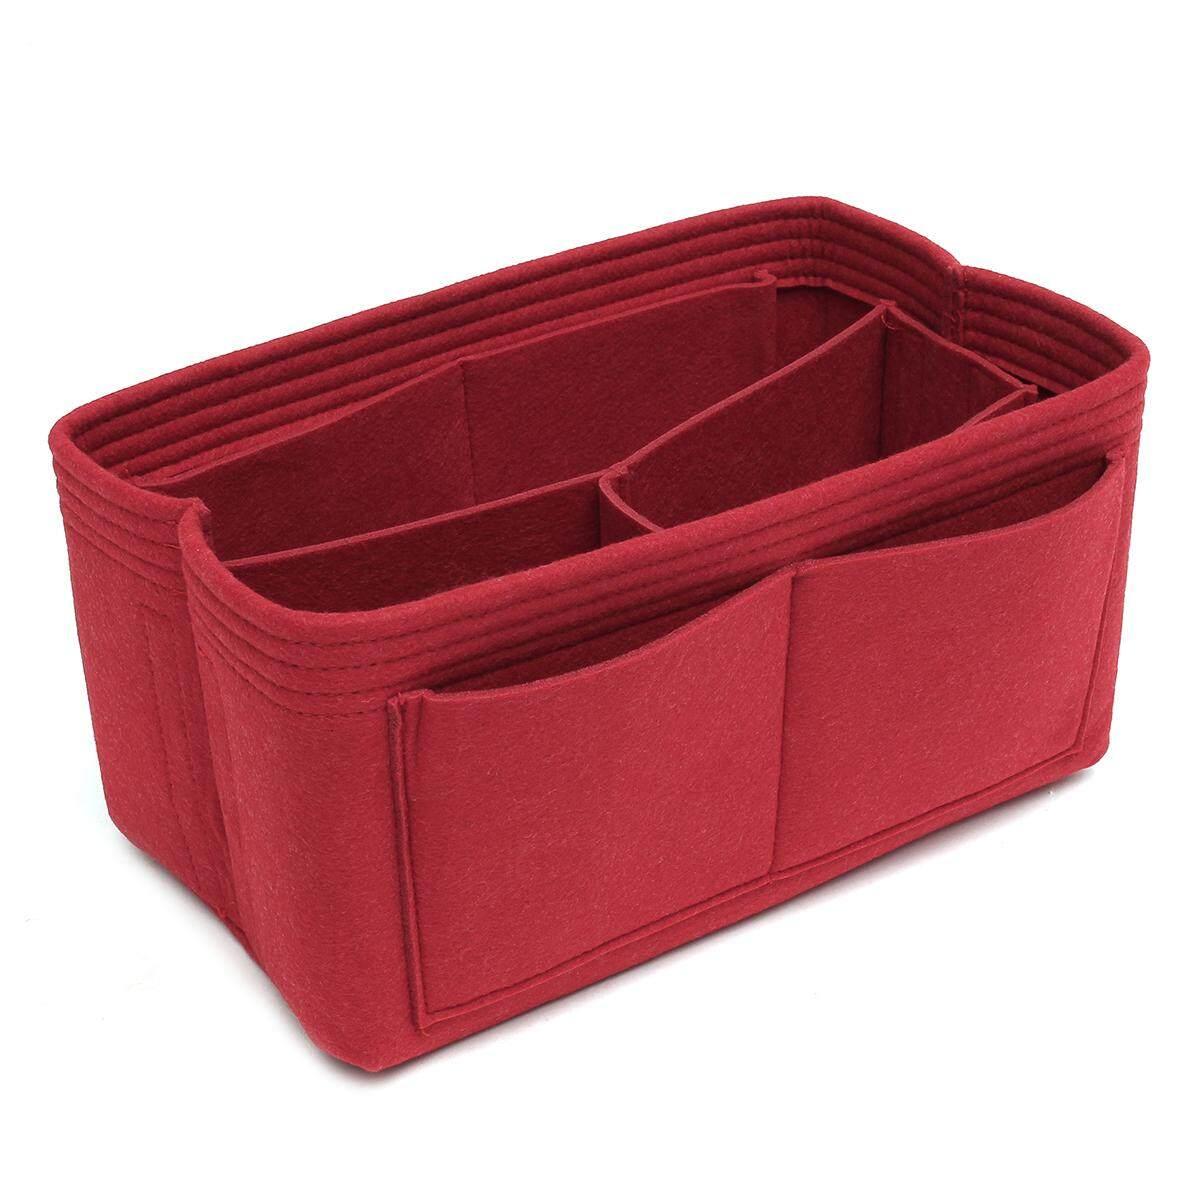 Neat felt bag organizer for Louis Vuitton Speedy 30 and 25(red 12x17.5x26cm)